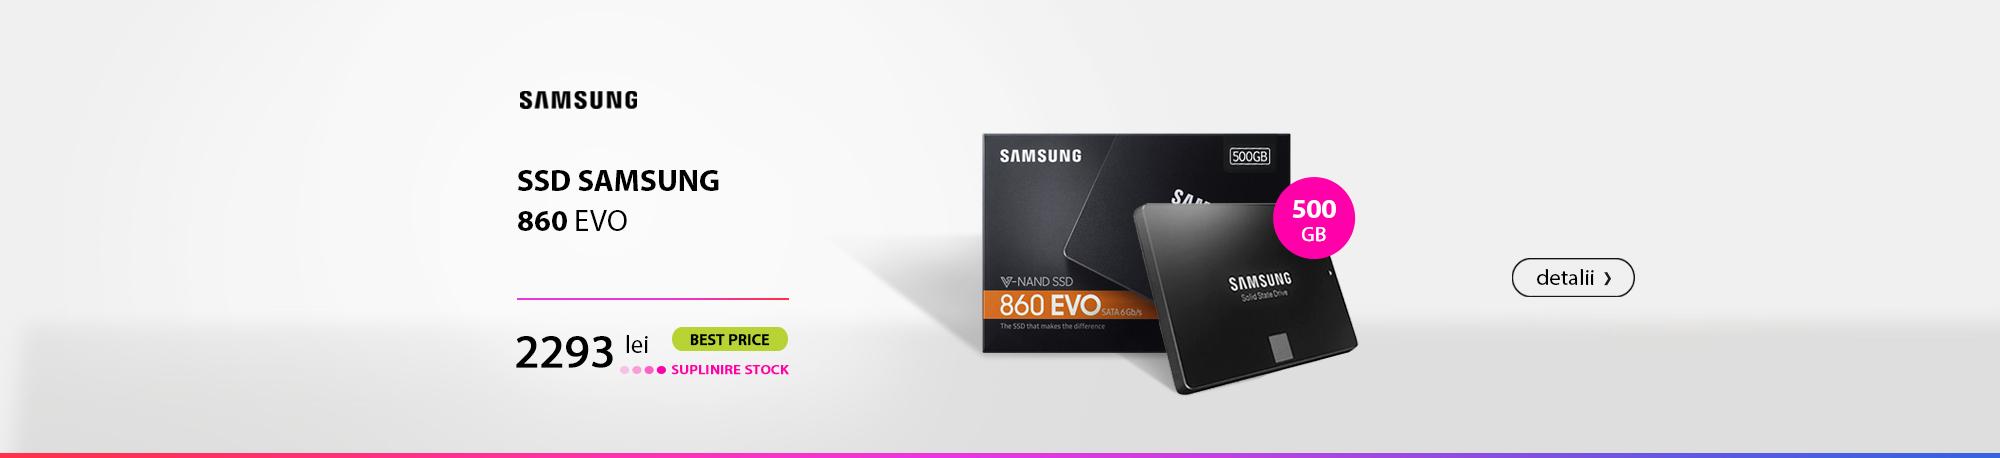 SSD 500GB Samsung 860 EVO.jpg